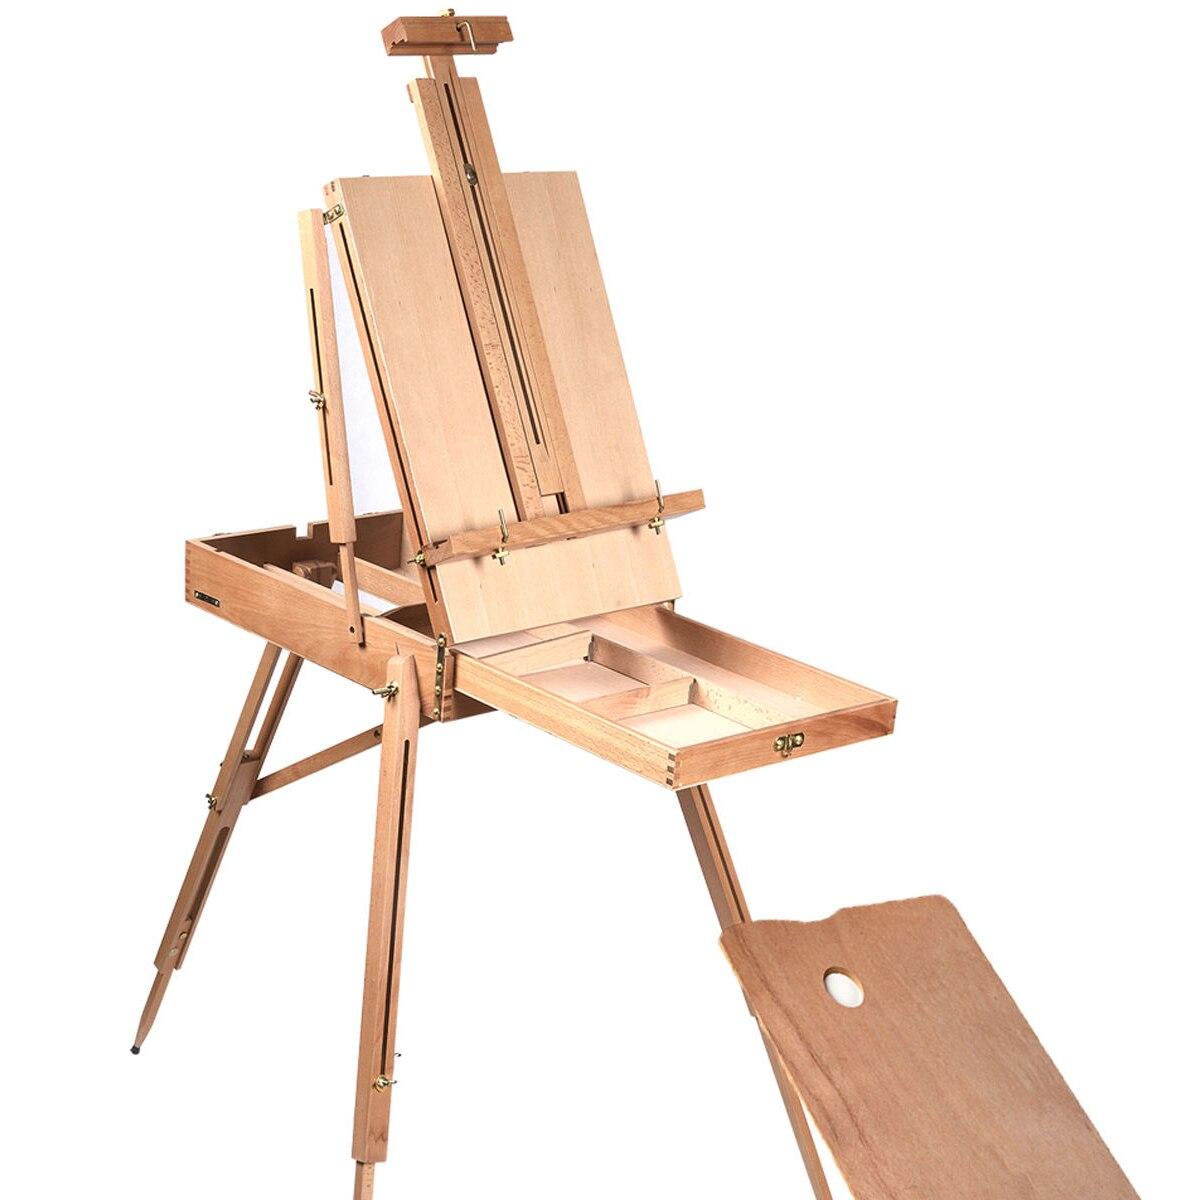 Portátil plegable Durable caballete de madera para la pintura de Color dibujo caja artista pintores trípode suministros de pintura caballetes